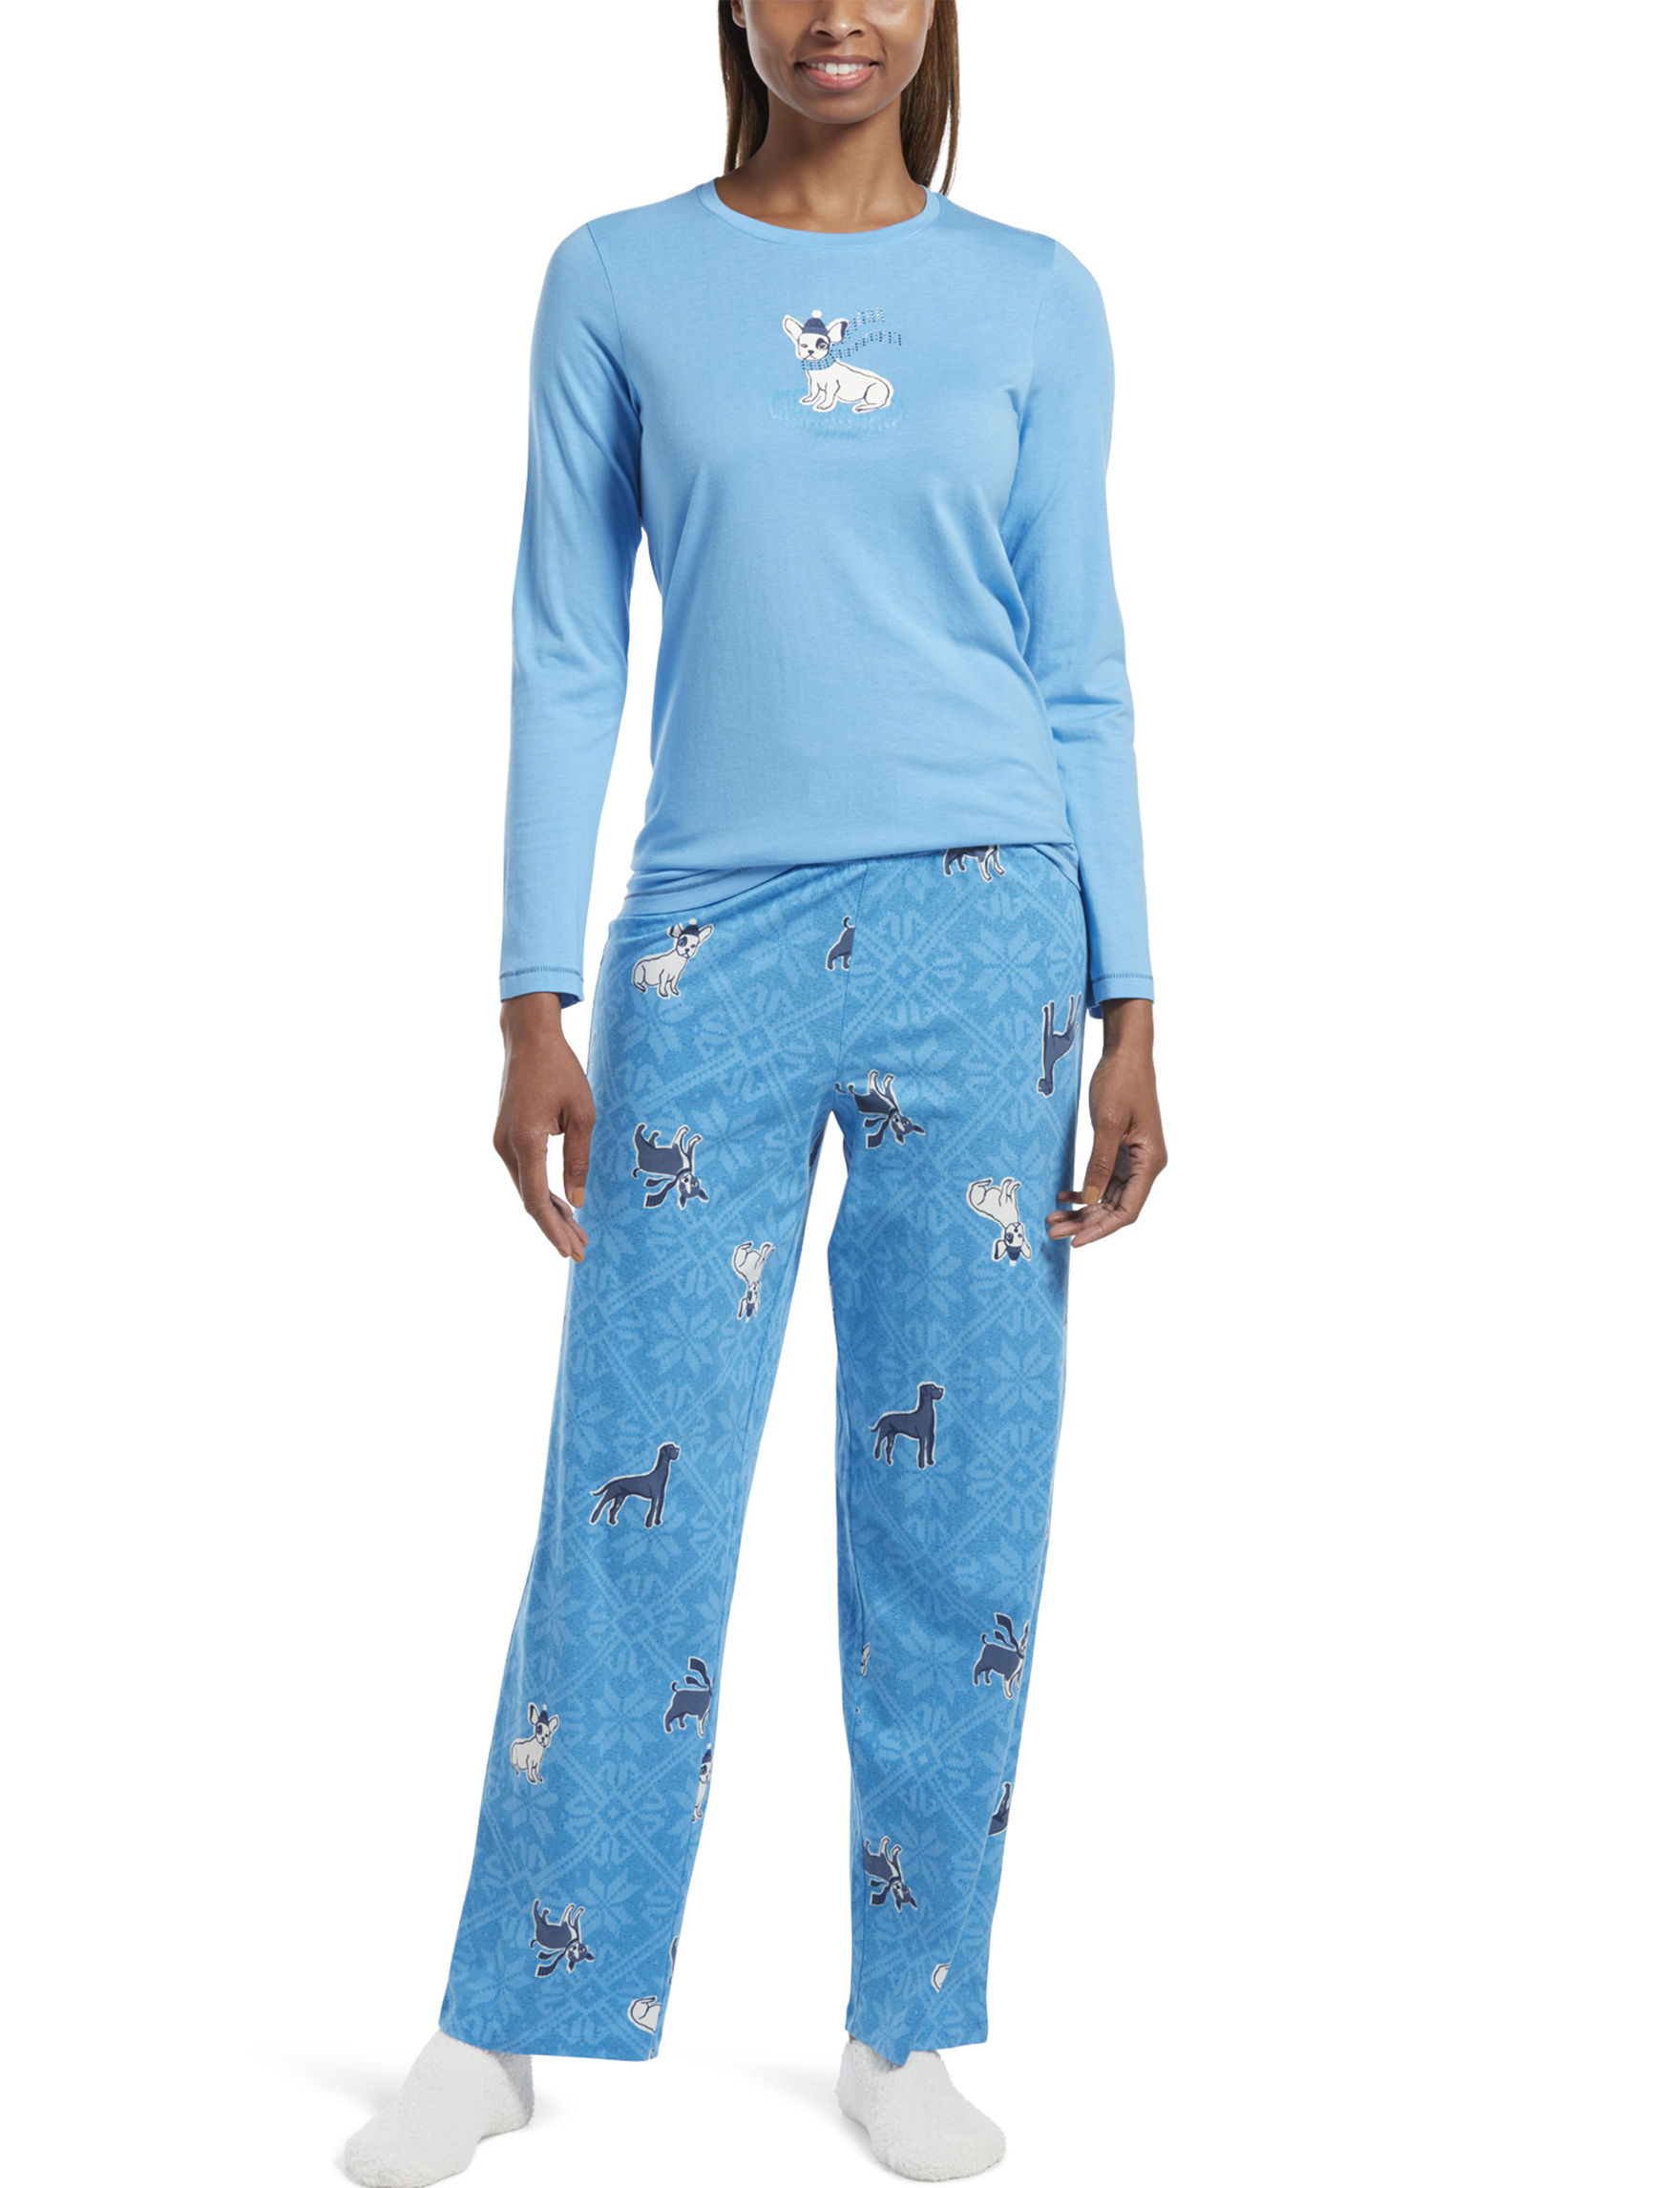 Hue Blue Pajama Sets